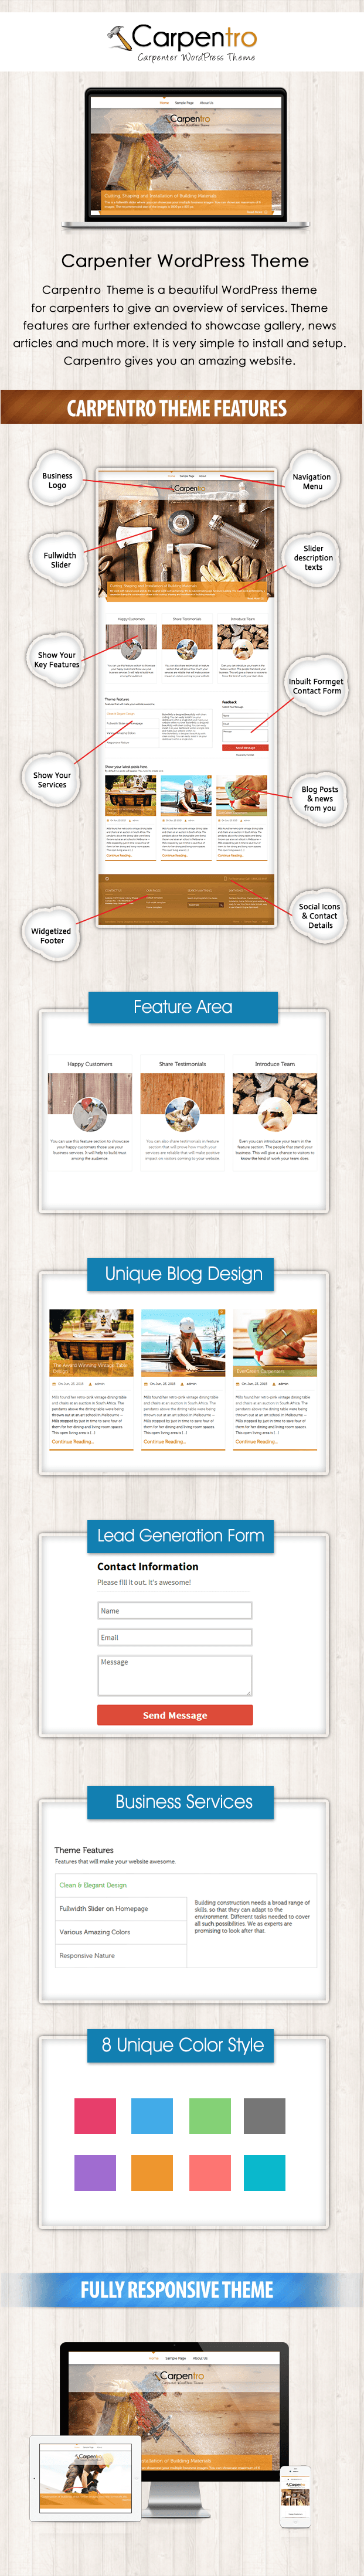 wordpress theme for carpenters